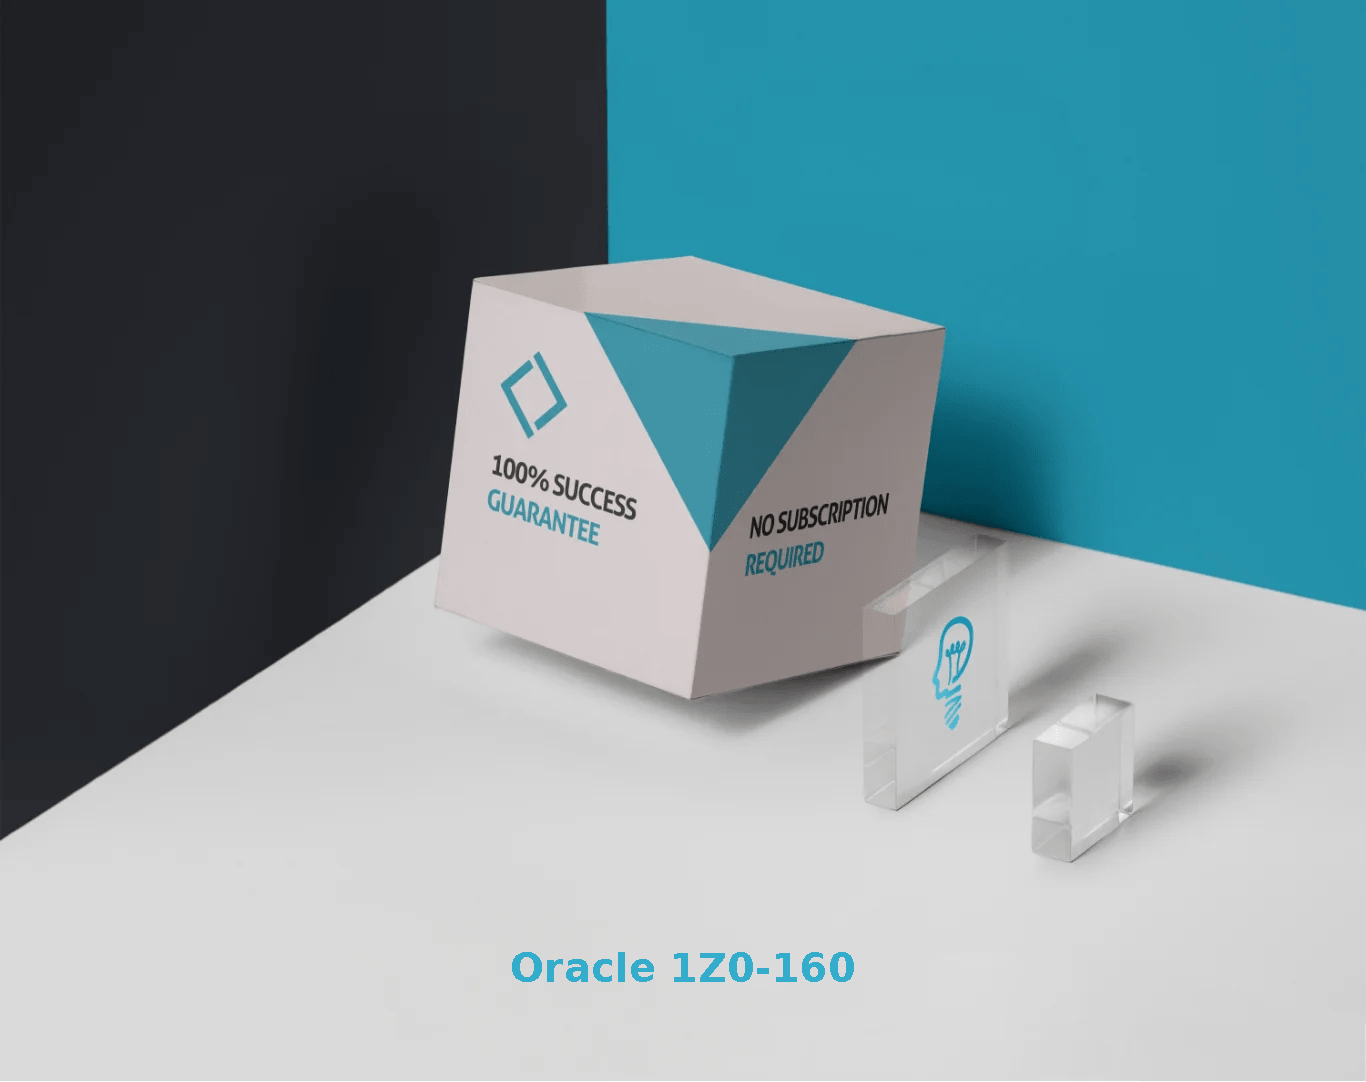 Oracle 1Z0-160 Exams